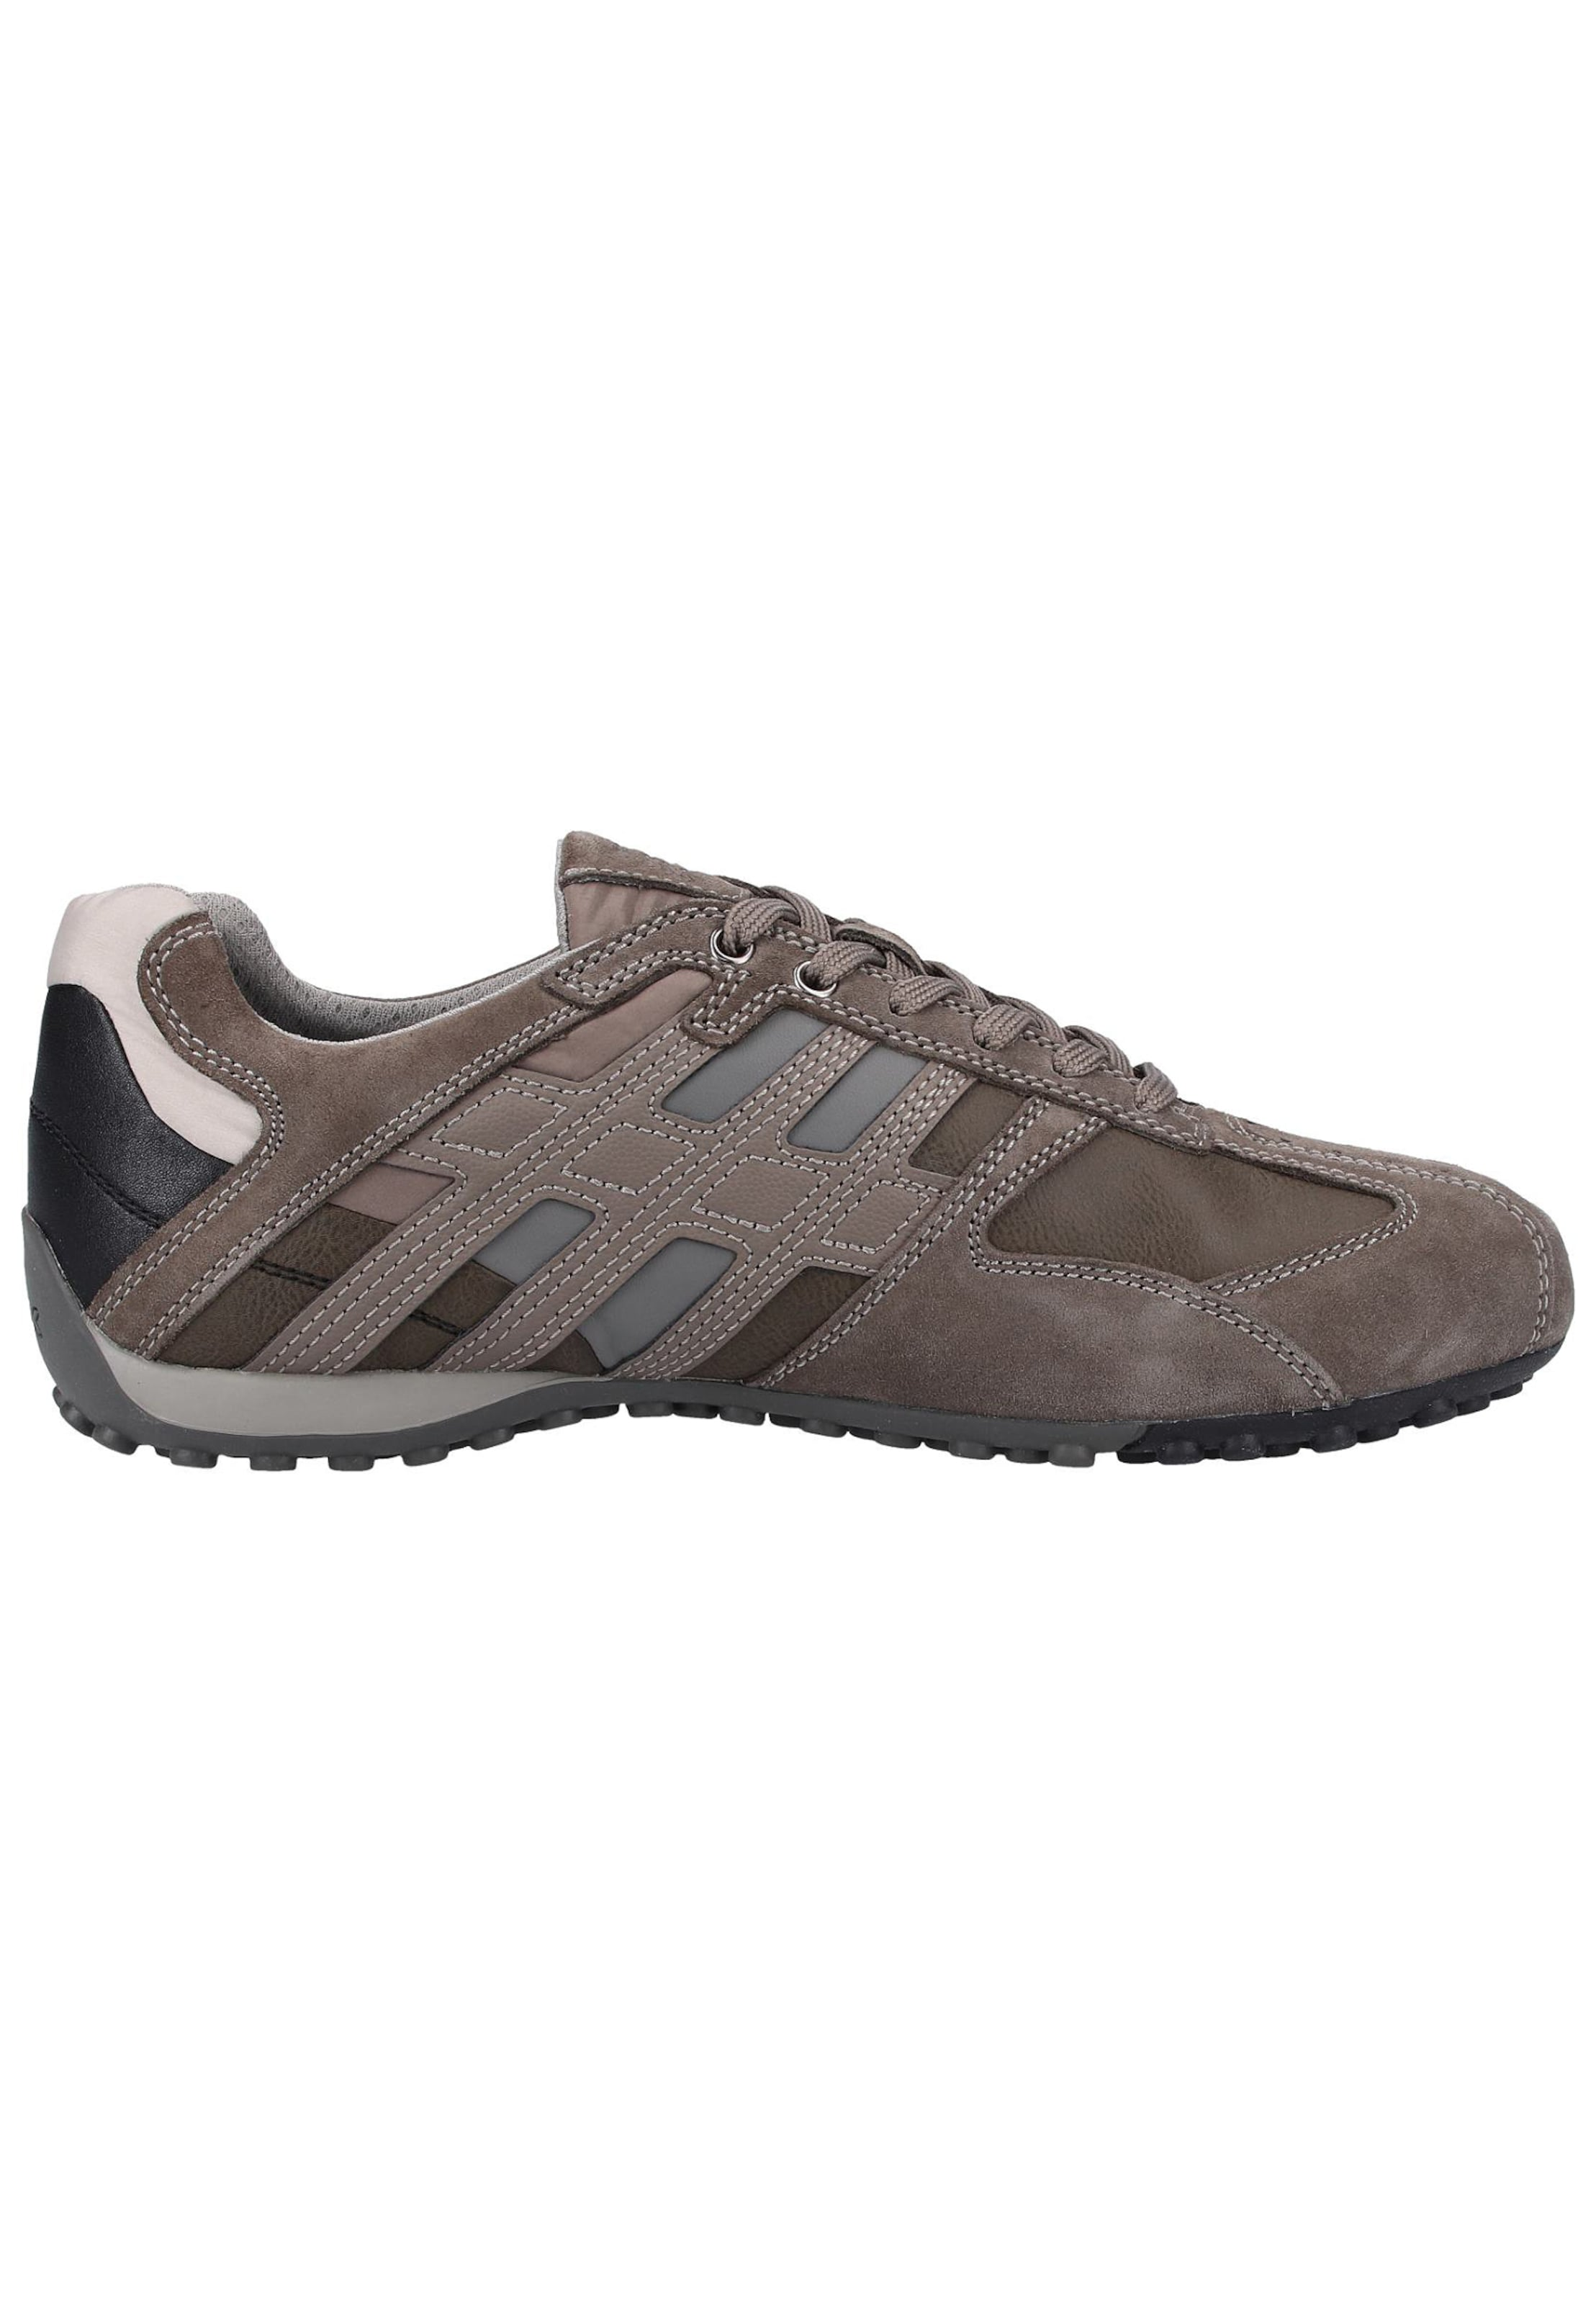 In GrauTaupe Schwarz Geox Sneakers Perlweiß 34AR5jL